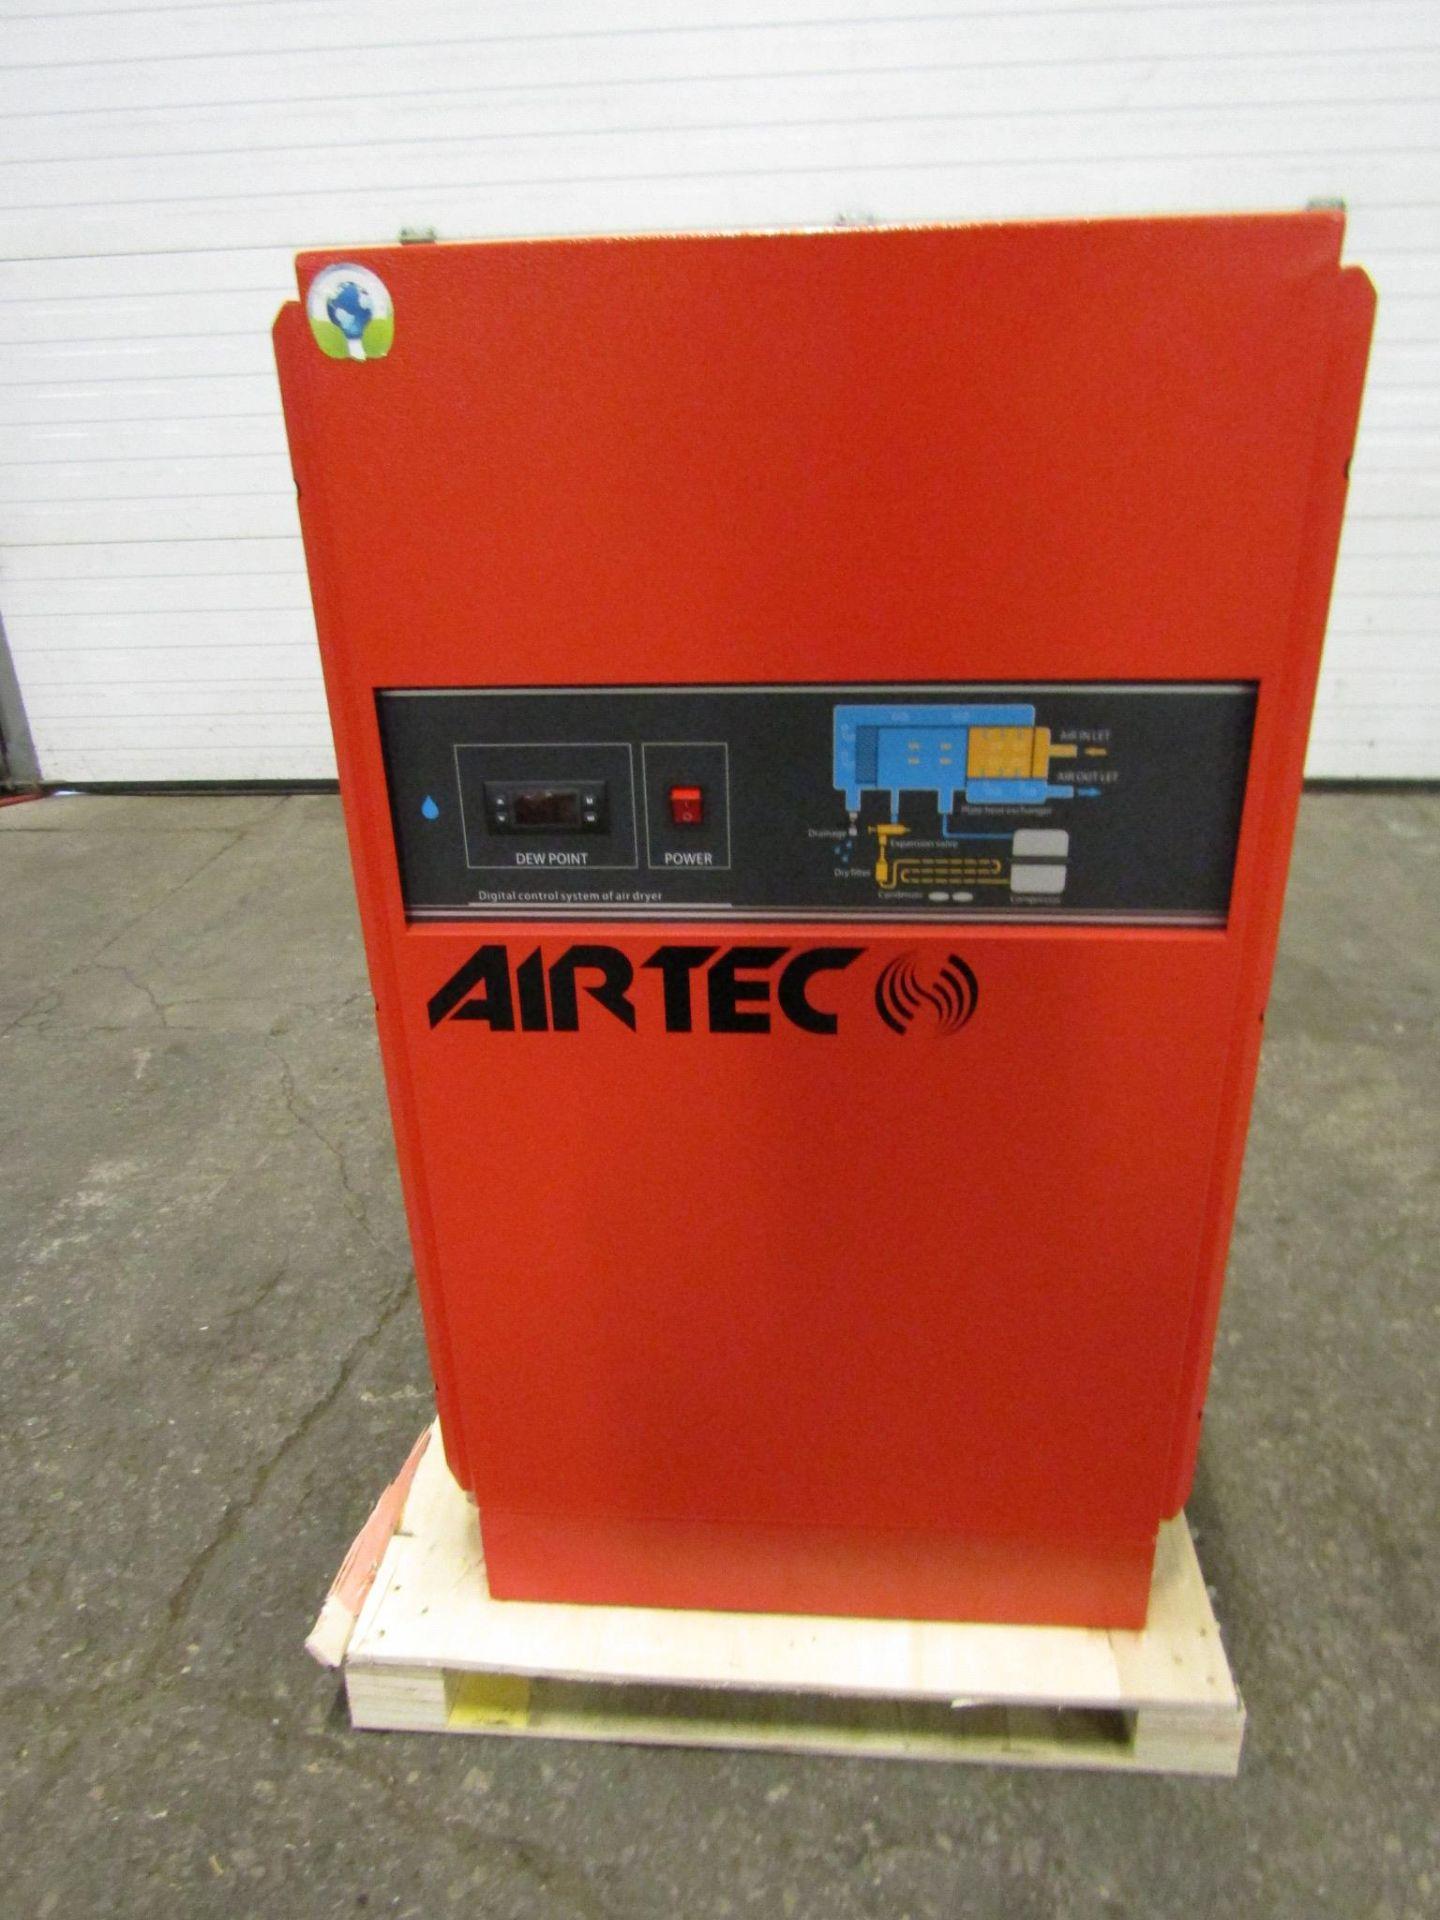 Lot 260 - MINT Airtec Compressed Air Dryer 371 CFM Unused new unit